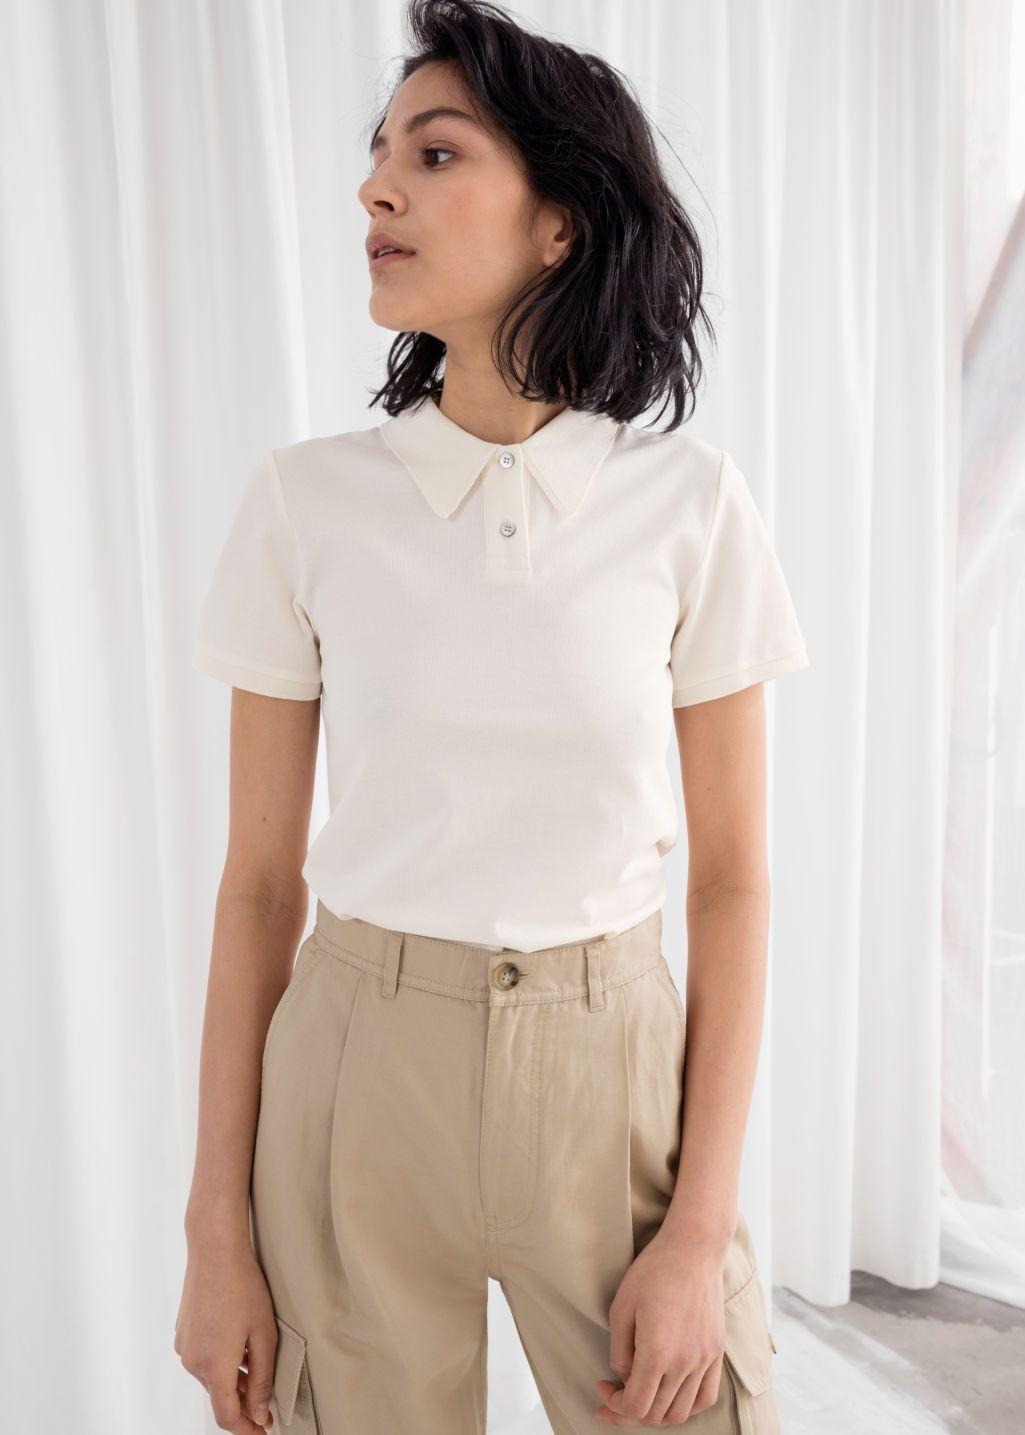 Cotton Polo T-Shirt   Polo outfits for women, White polo outfit ...